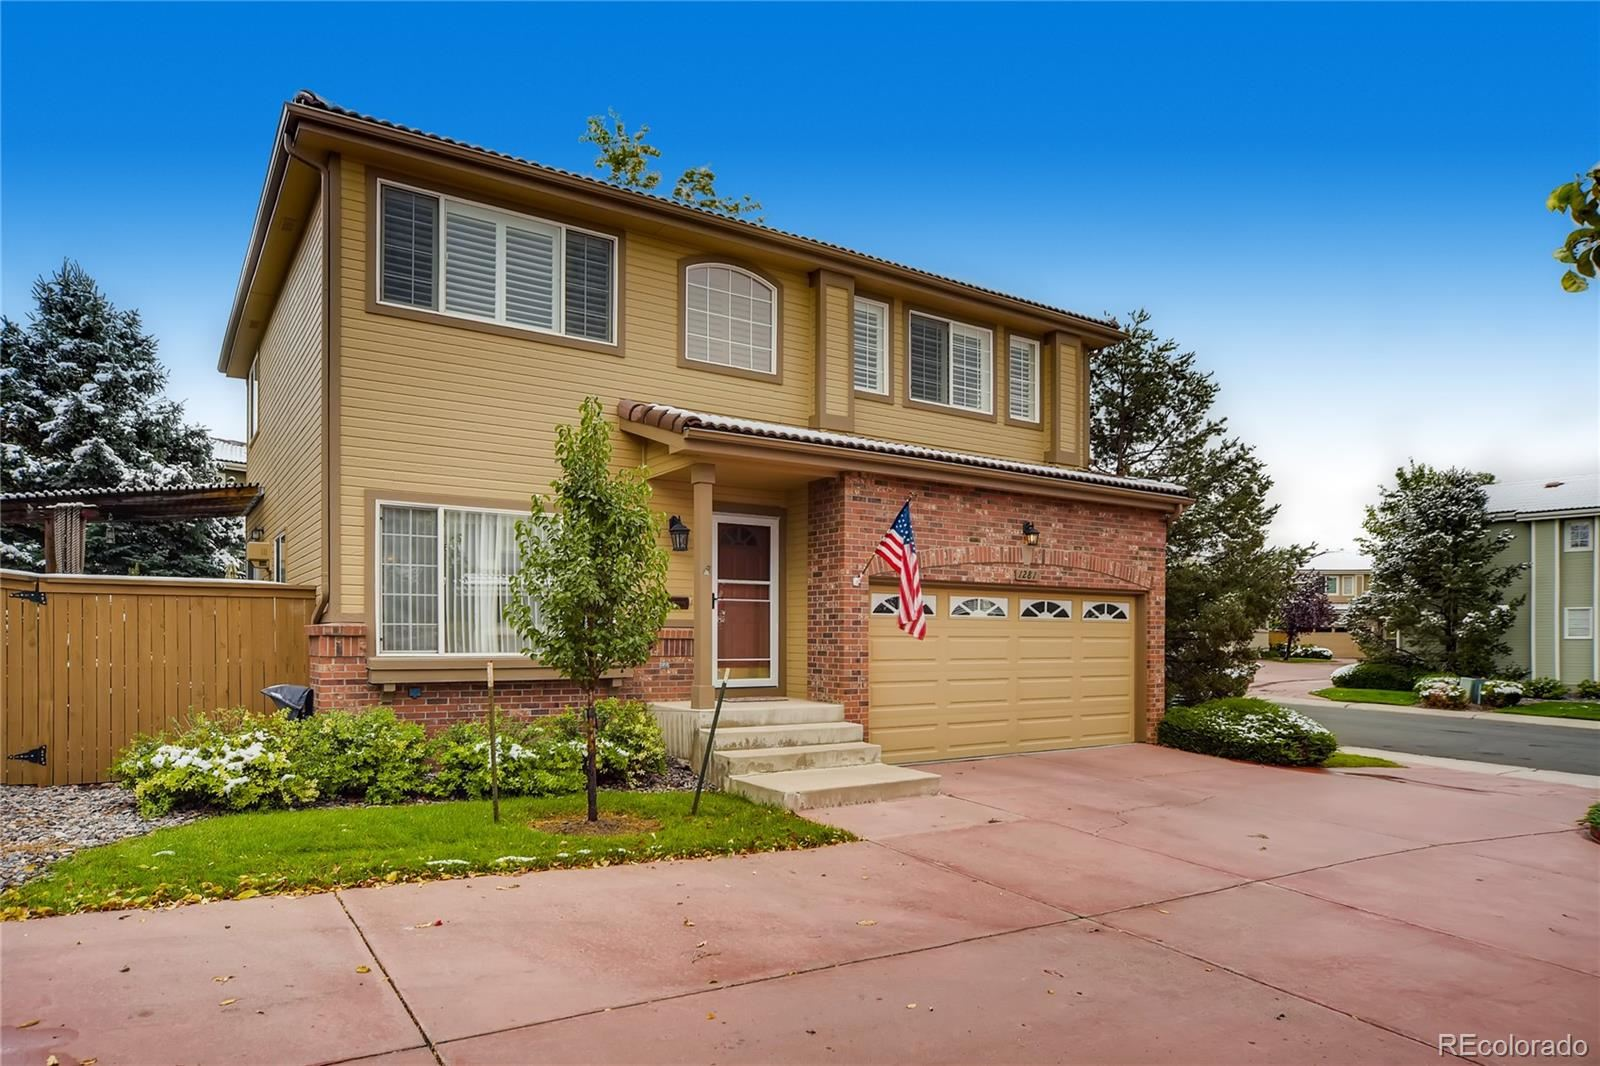 1281 Laurenwood Way, Highlands Ranch, CO 80129 - #: 2399096